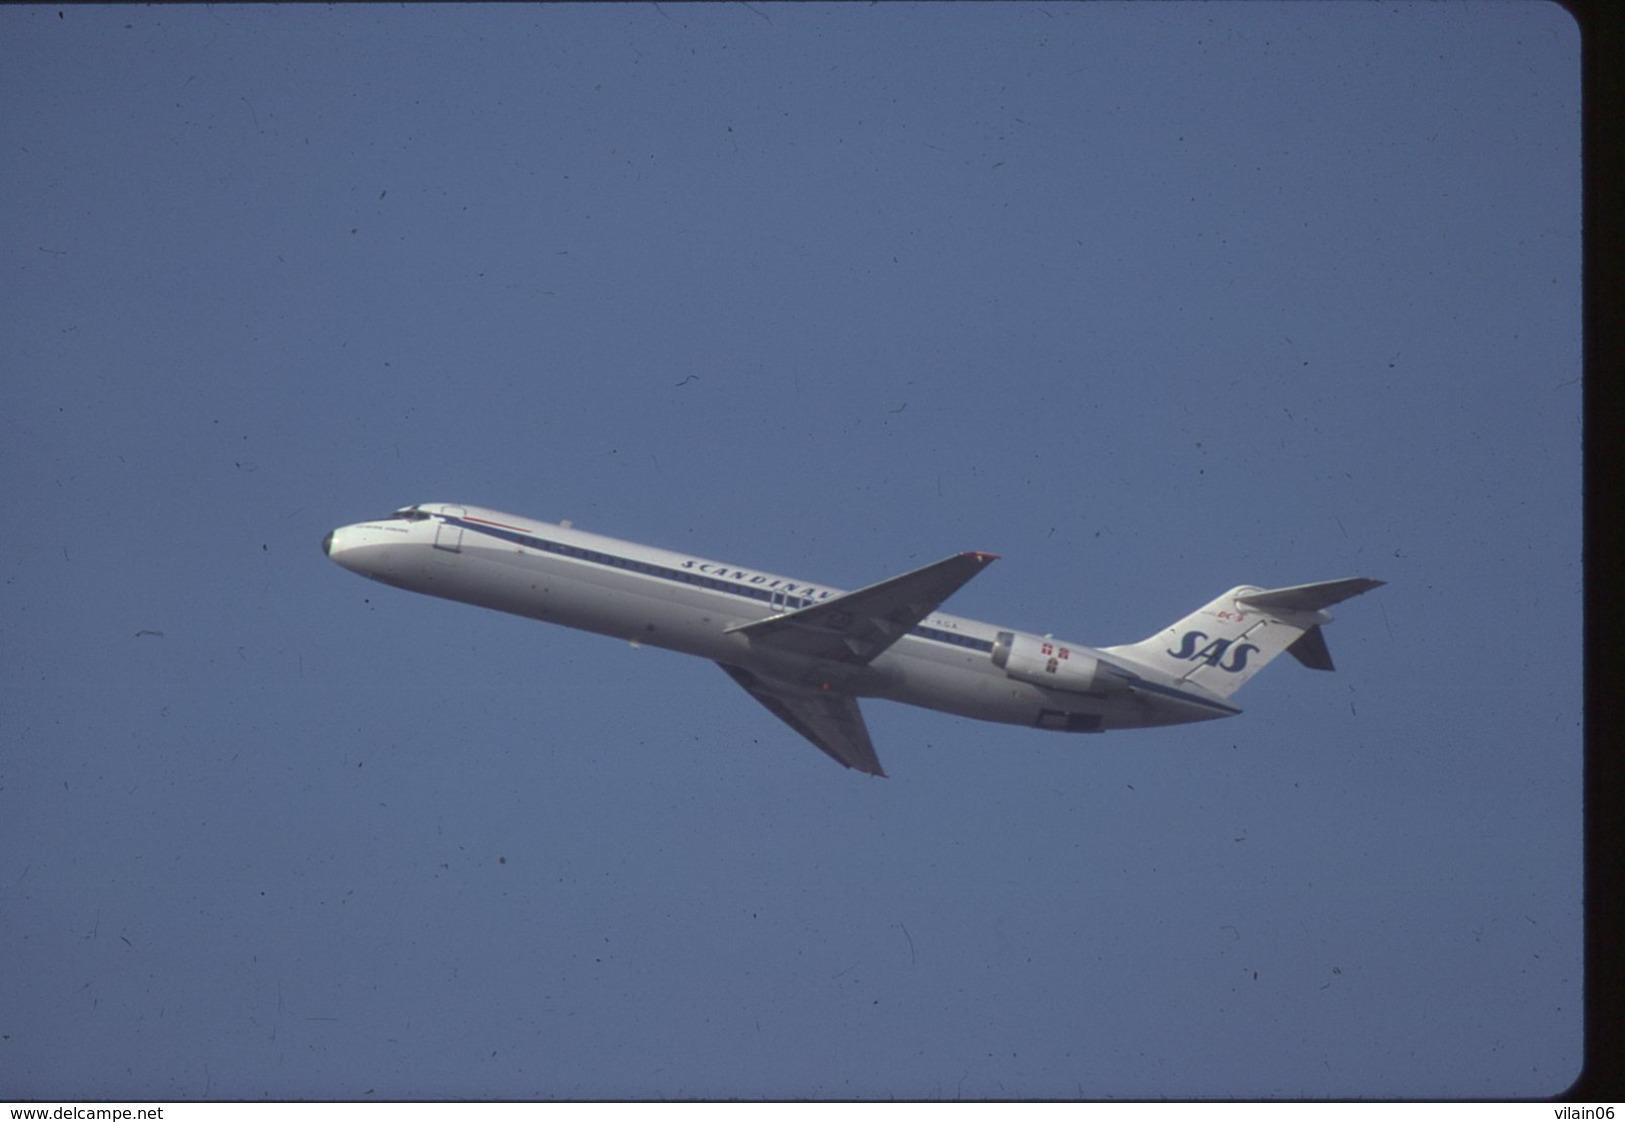 SLIDE / AVION / AIRCRAFT   KODAK  ORIGINAL  SAS  DC 9  OY-KGA - Diapositive